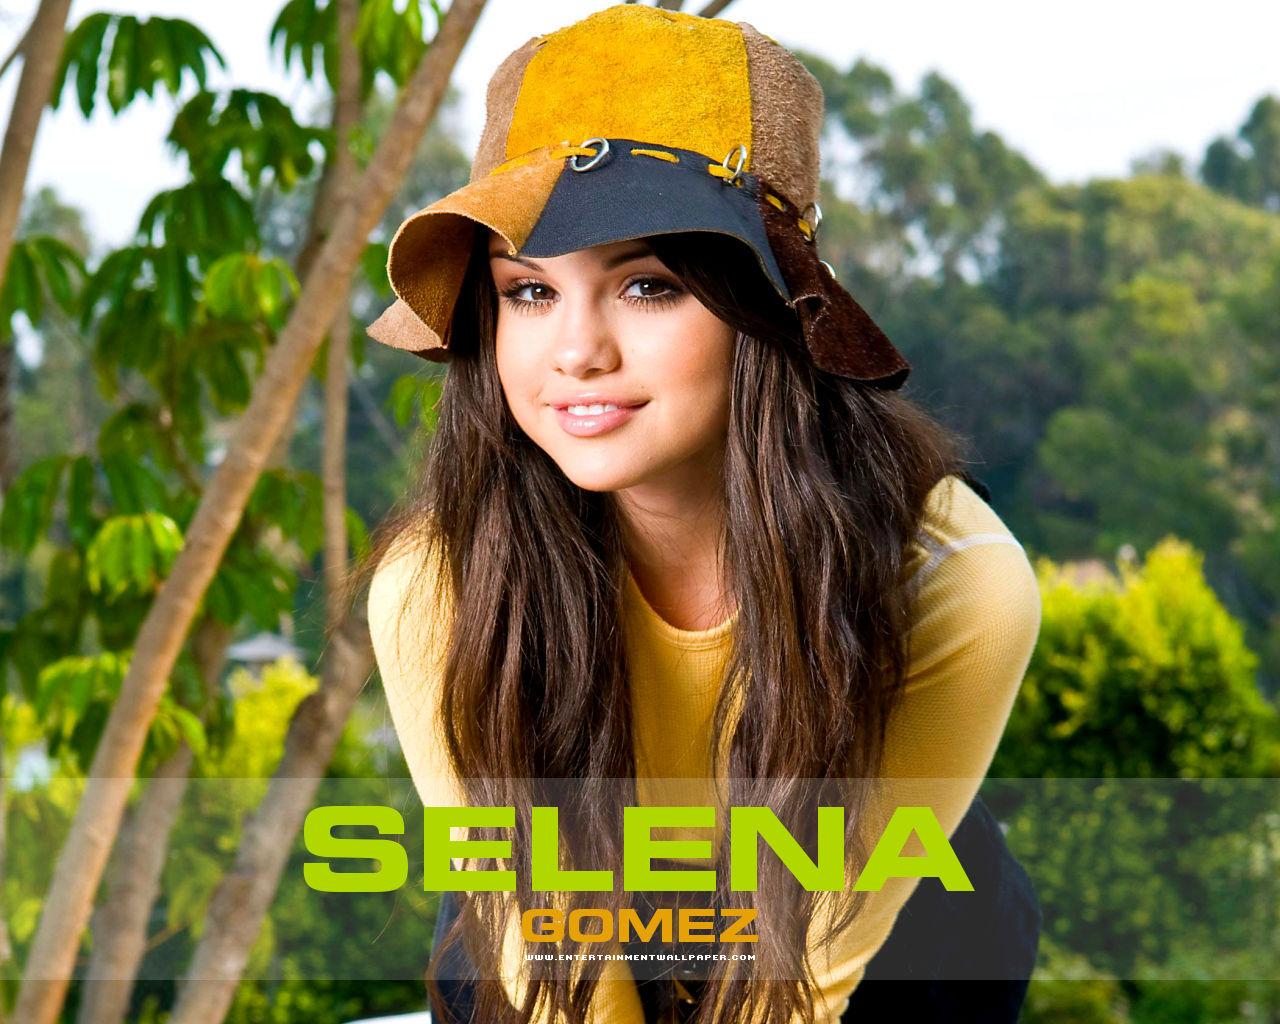 Selena Gomez Wallpapers